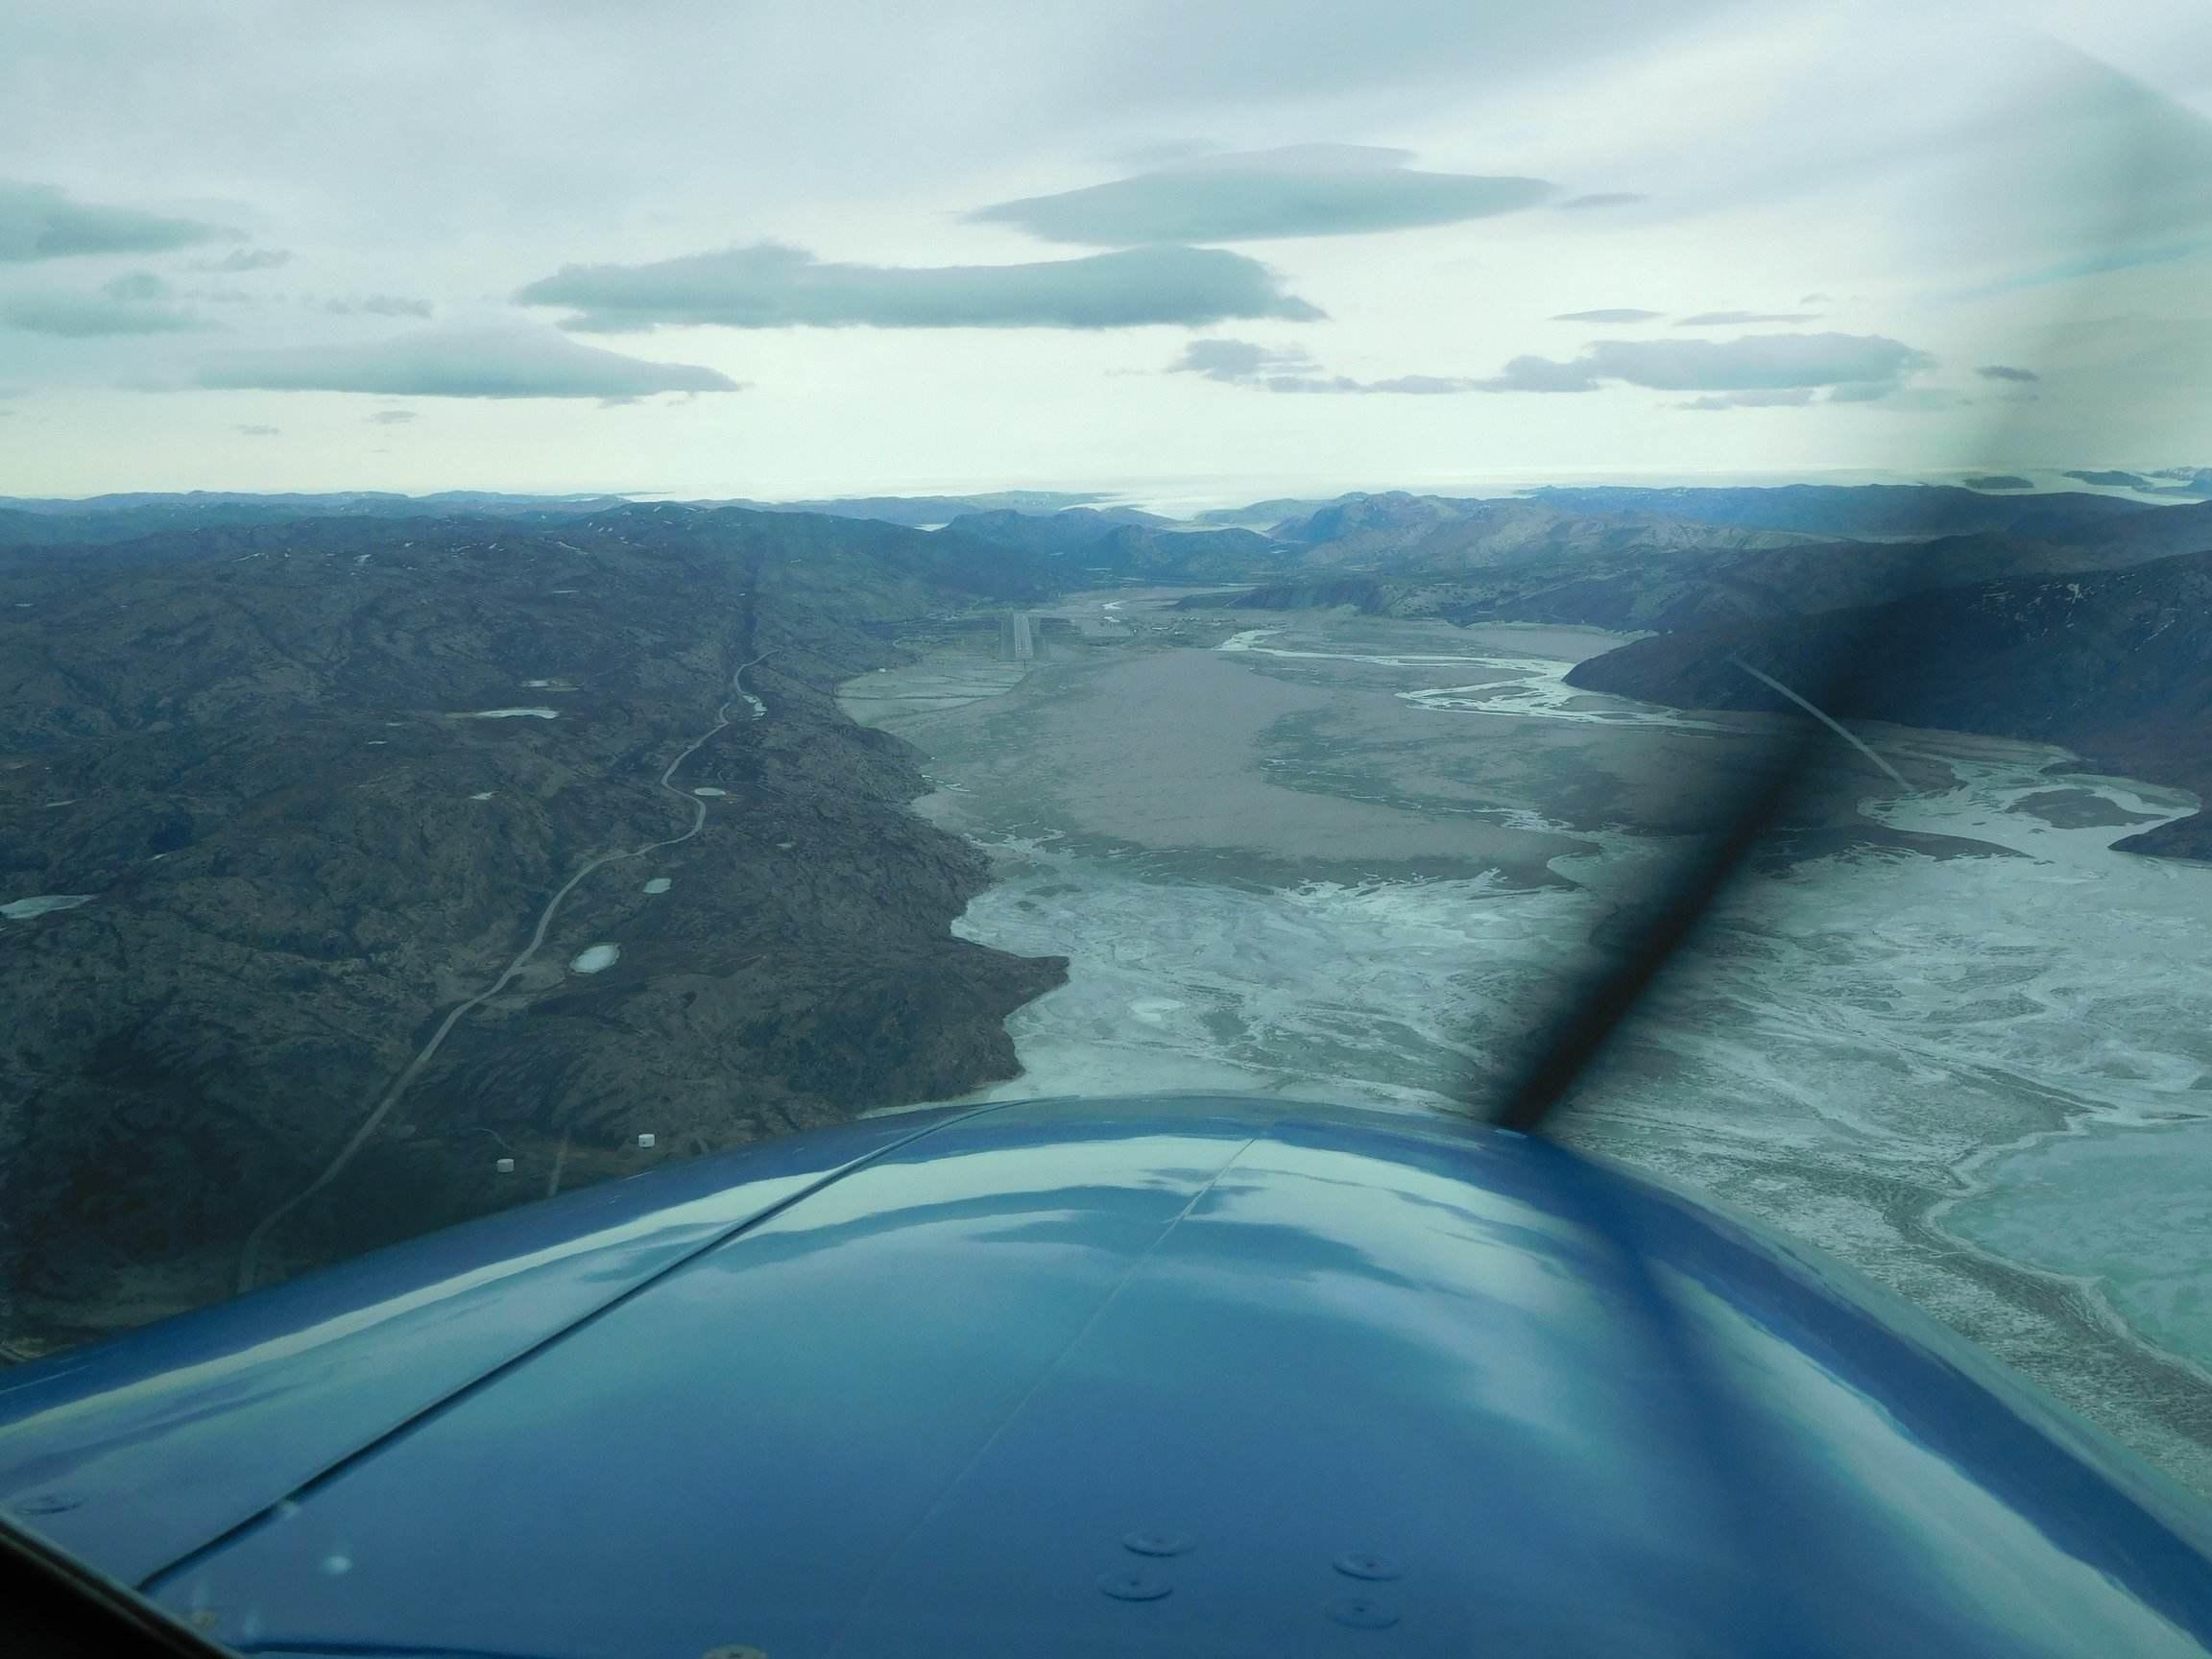 Sondre Stromfjord Airport